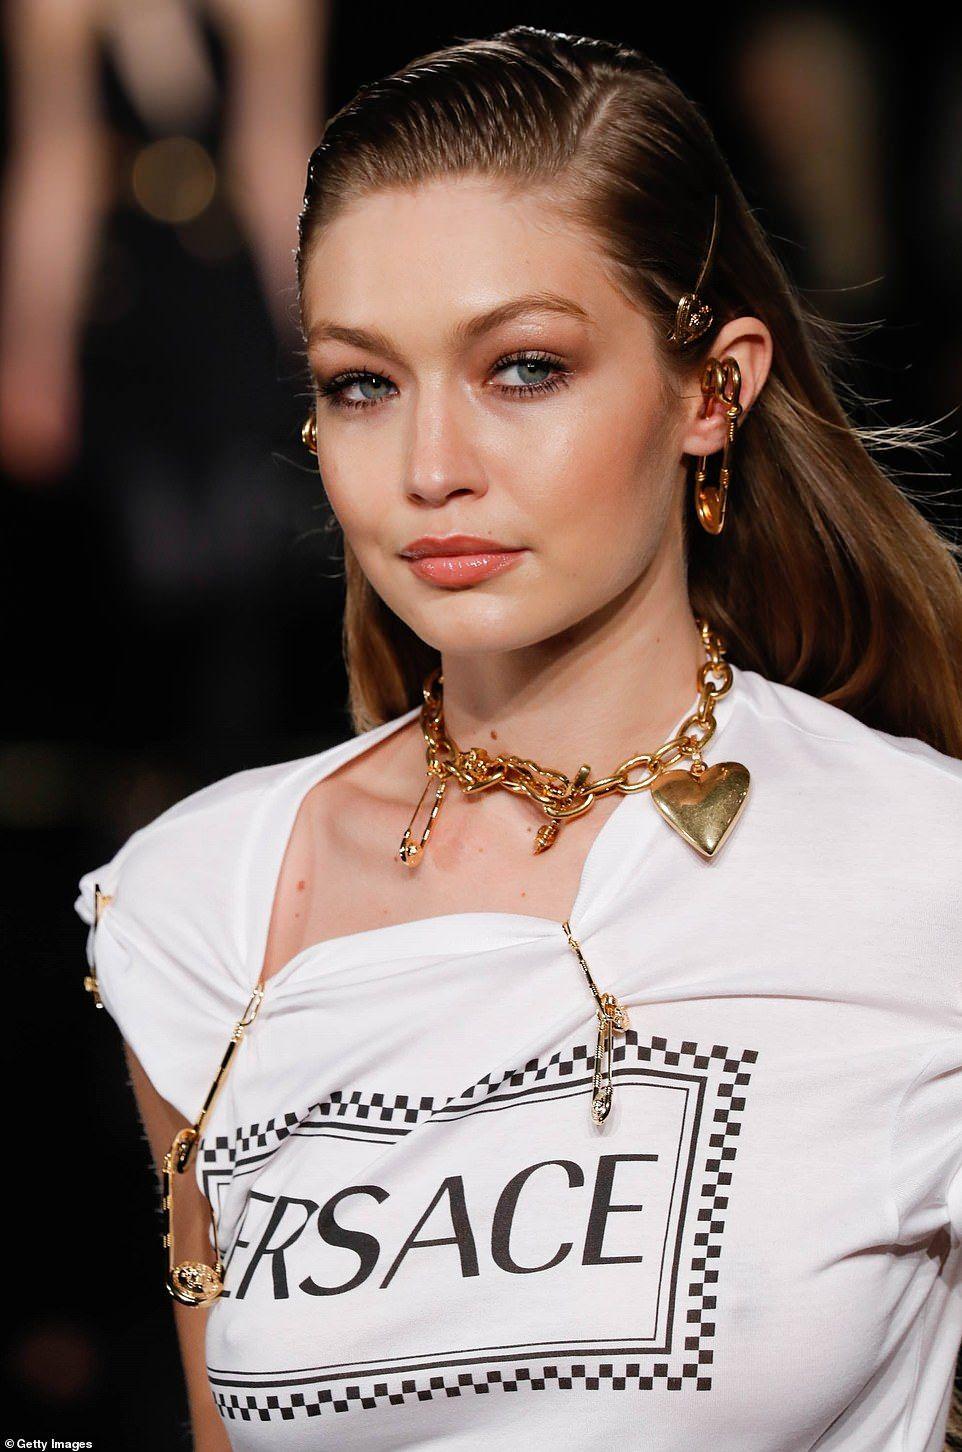 Hailey Baldwin and Gigi Hadid strut the Versace runway in NYC – WhoRunTheWorld♀️